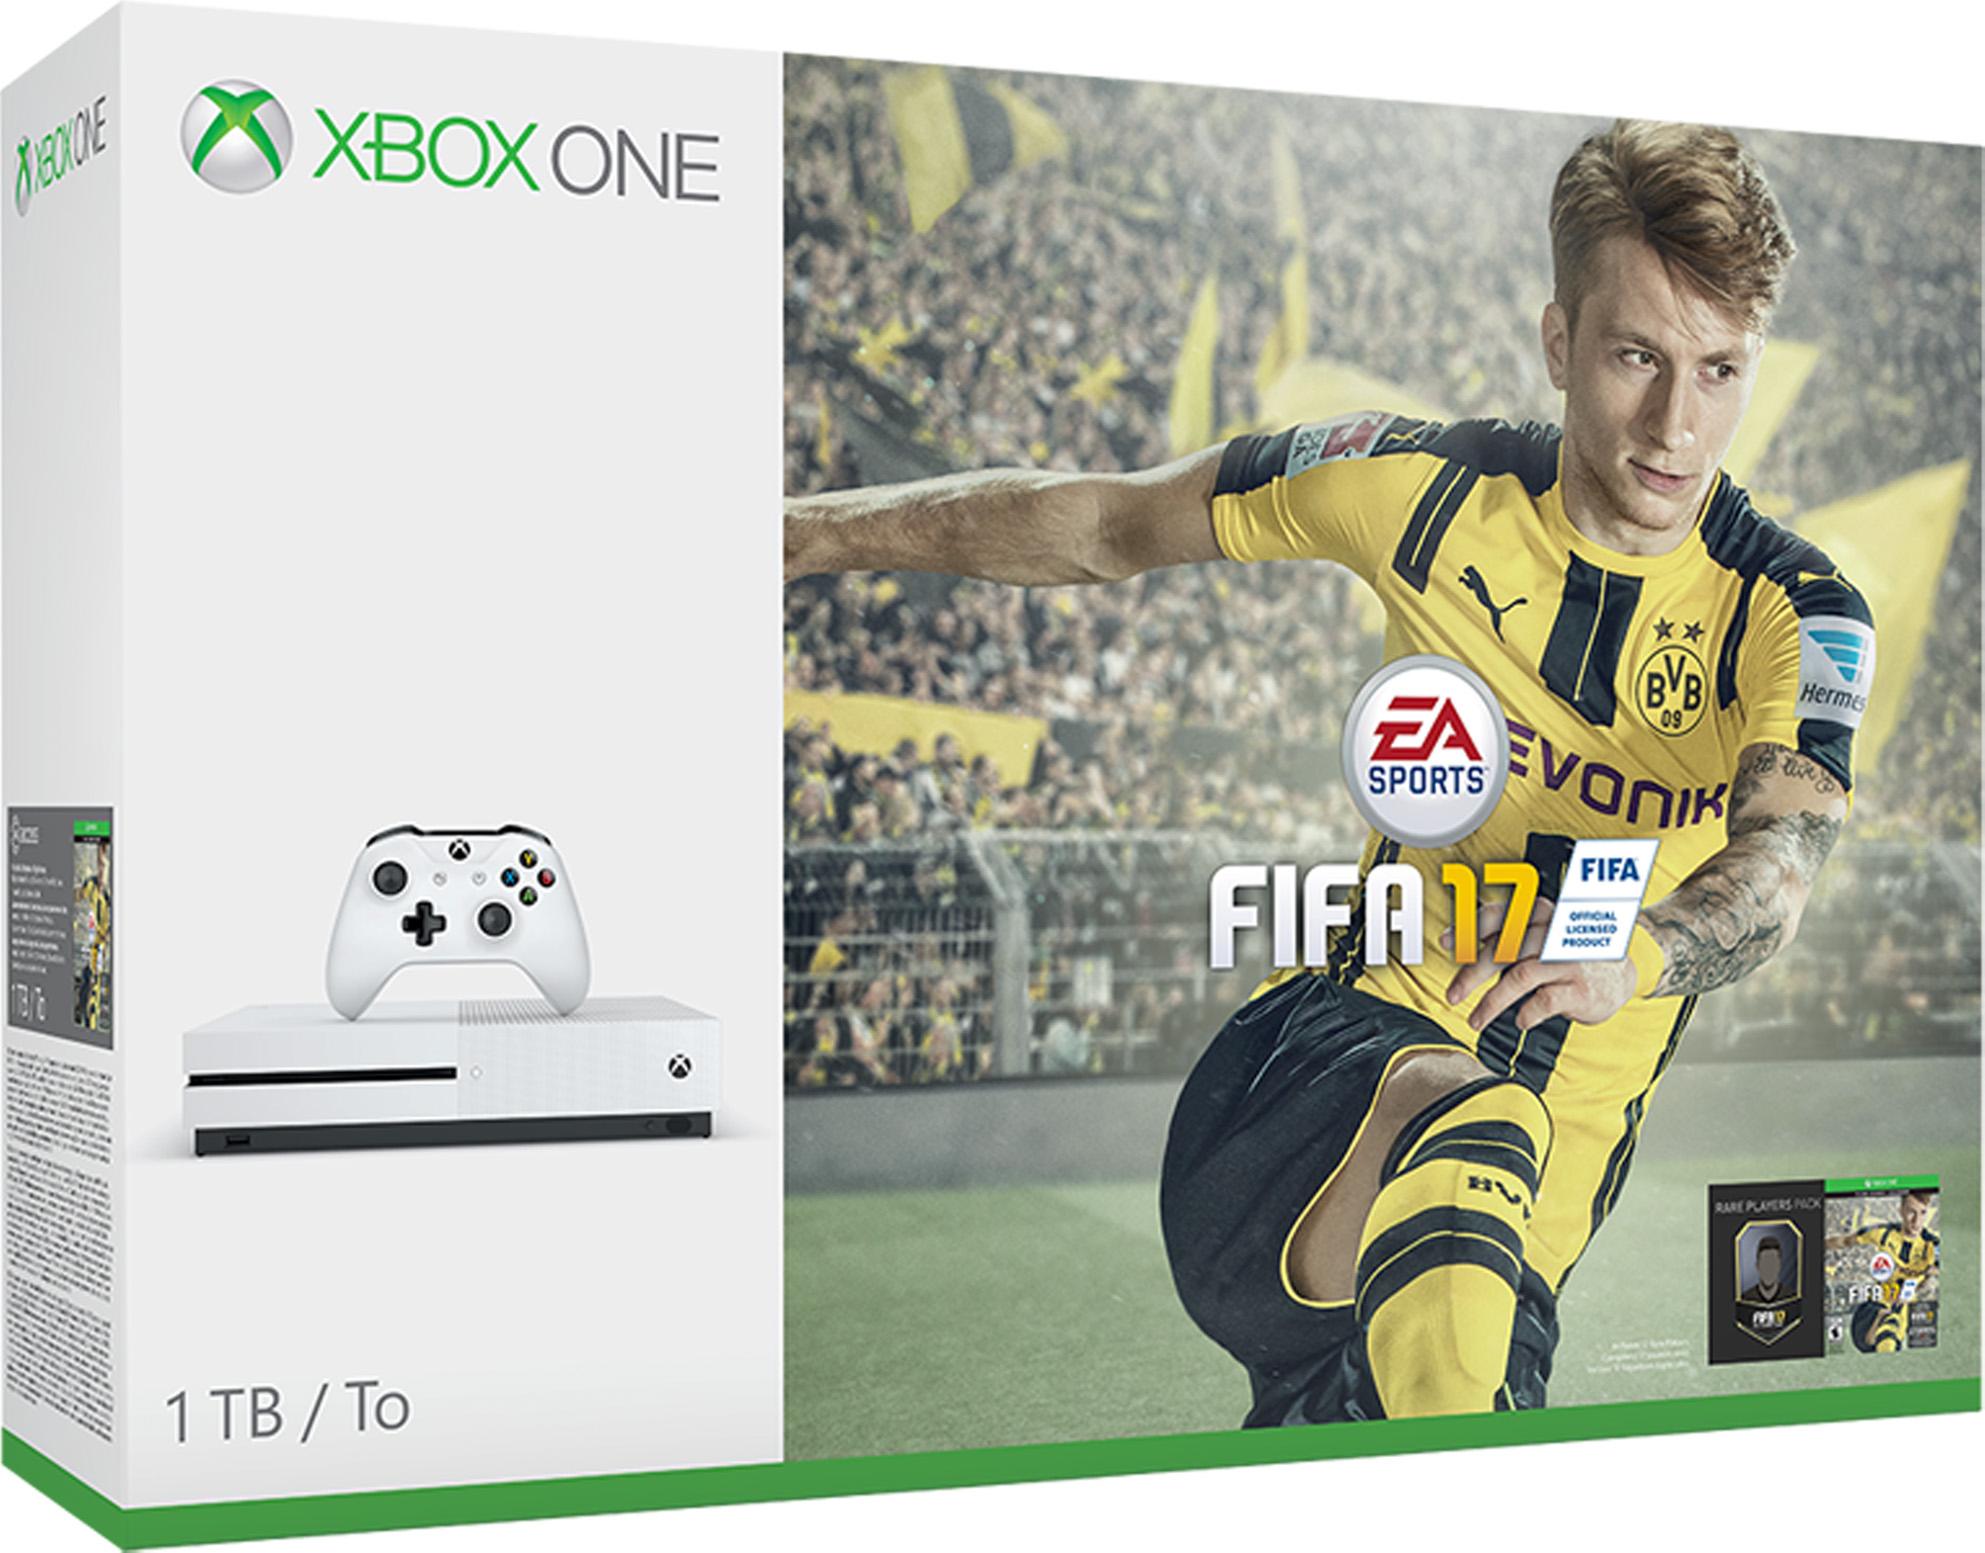 Xbox One S FIFA 17 Bundles